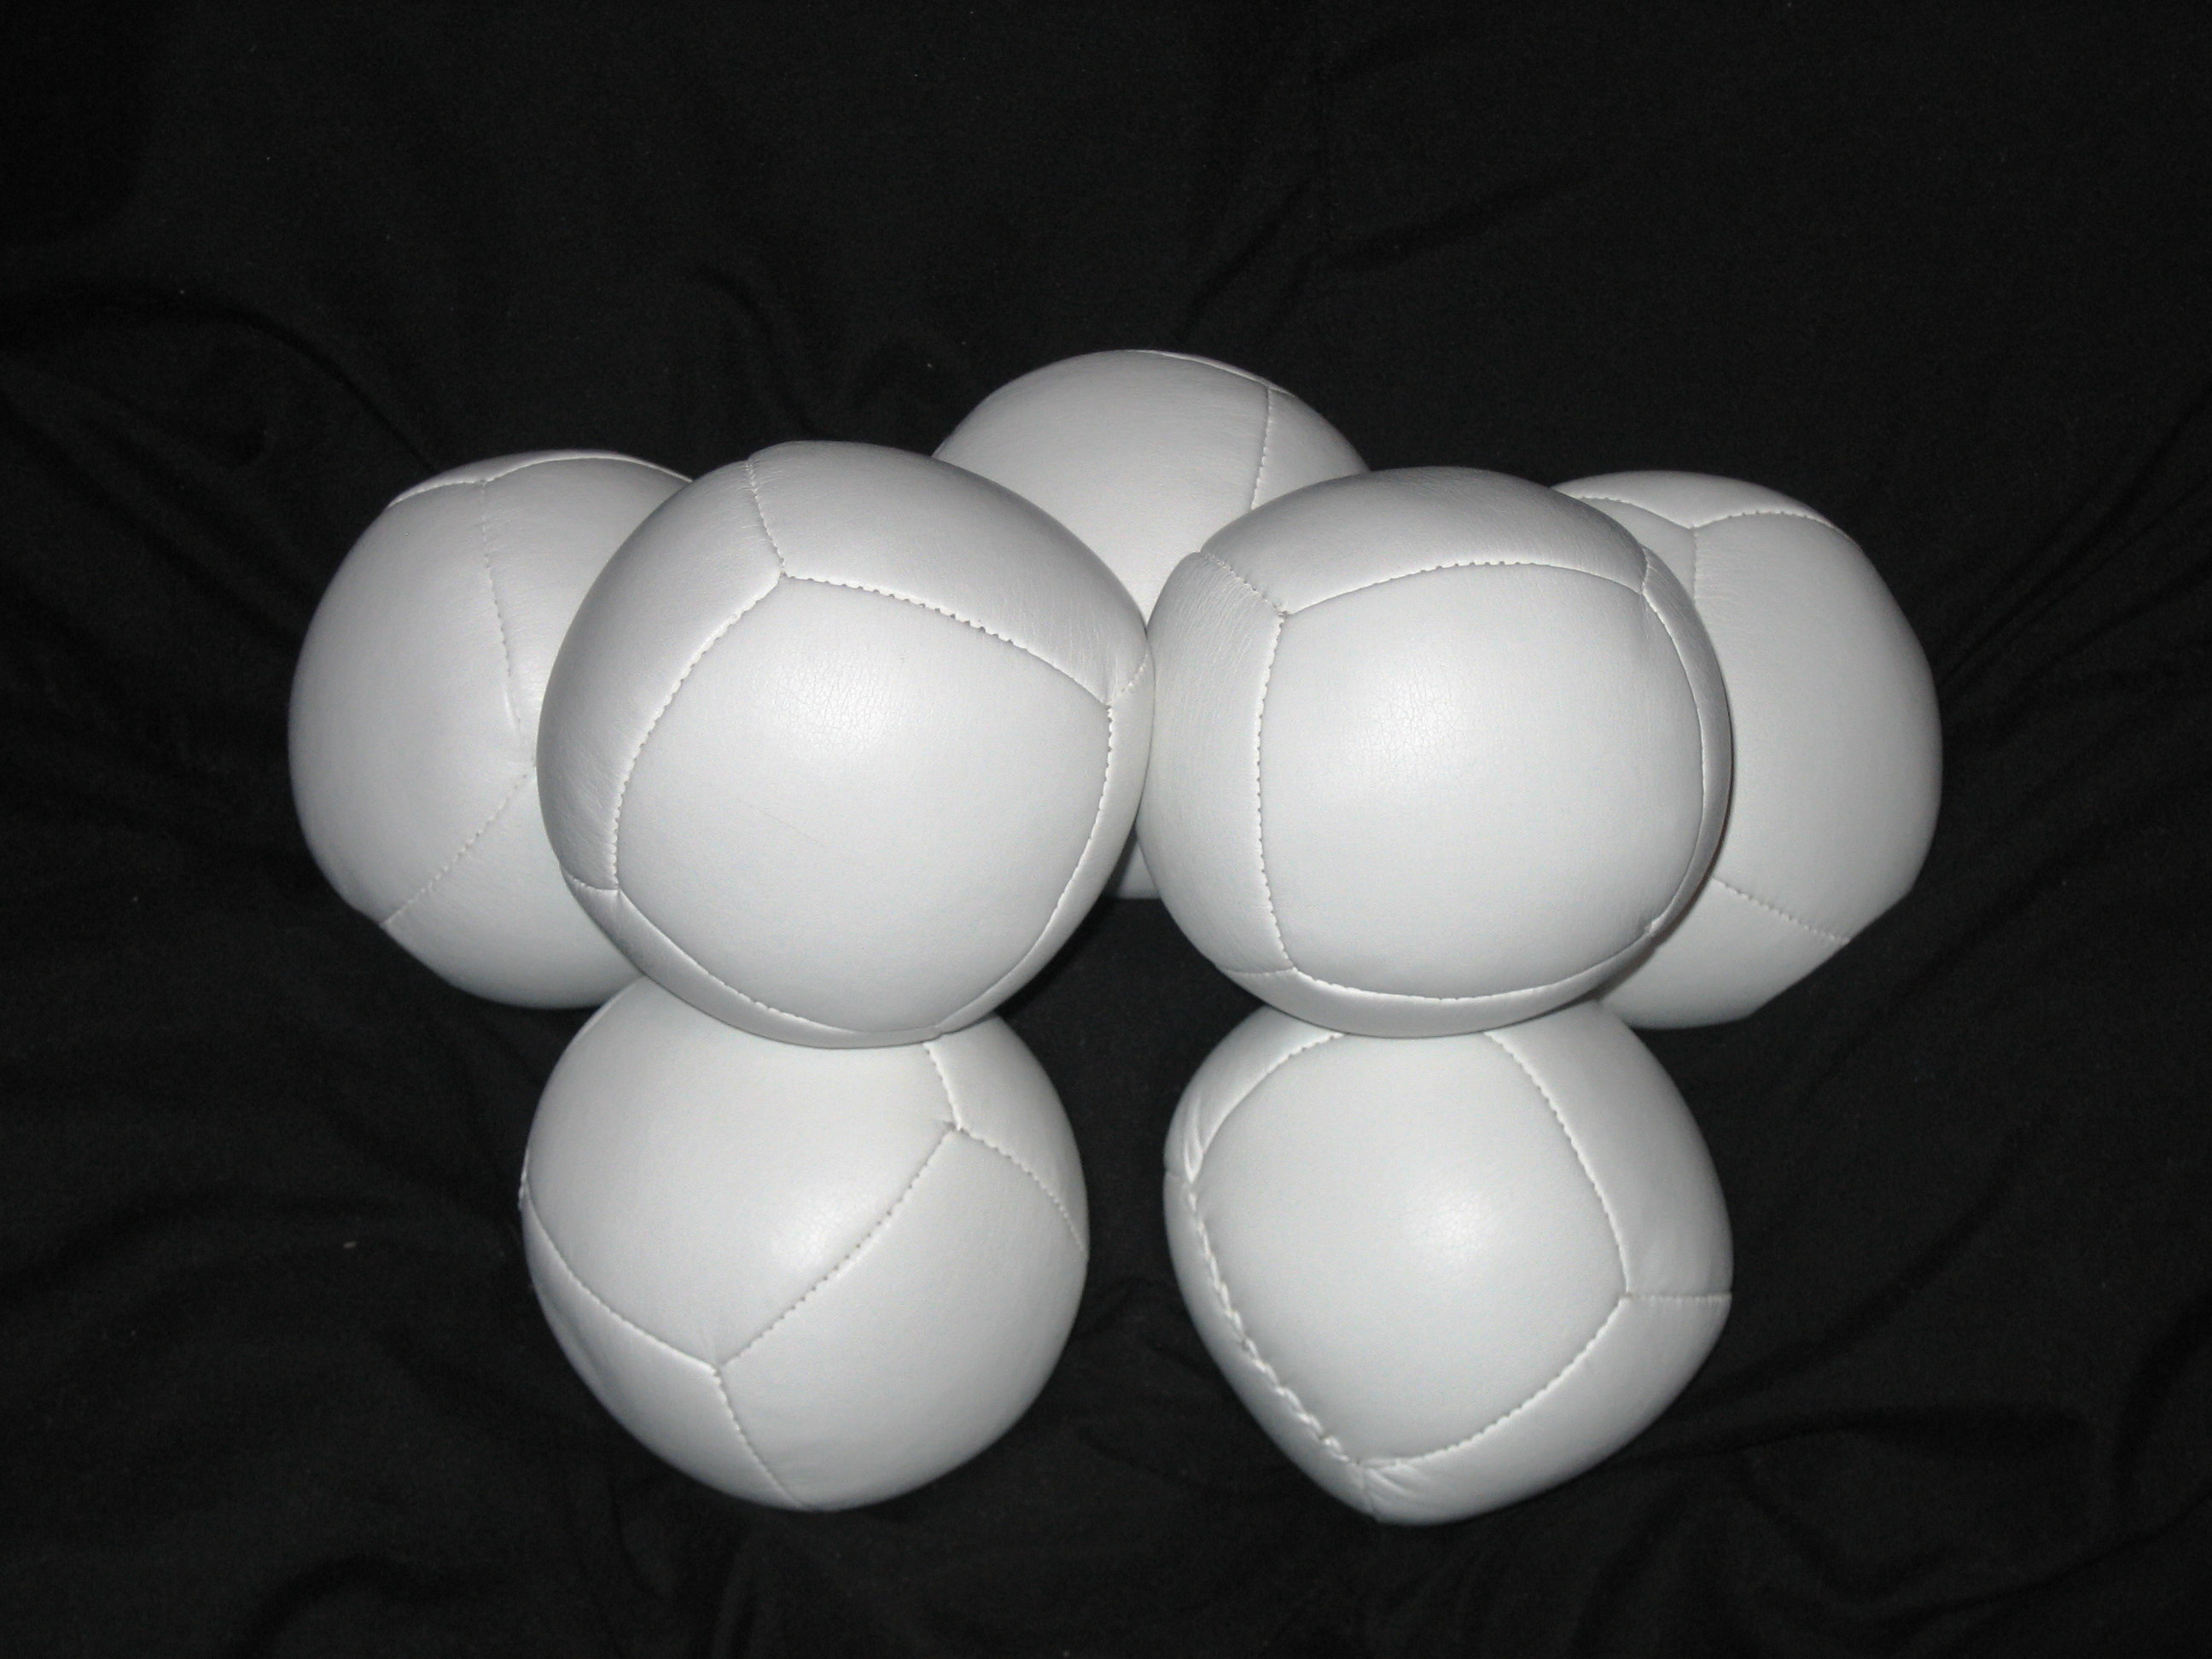 Stupendous Juggling Ball Wikipedia Dailytribune Chair Design For Home Dailytribuneorg